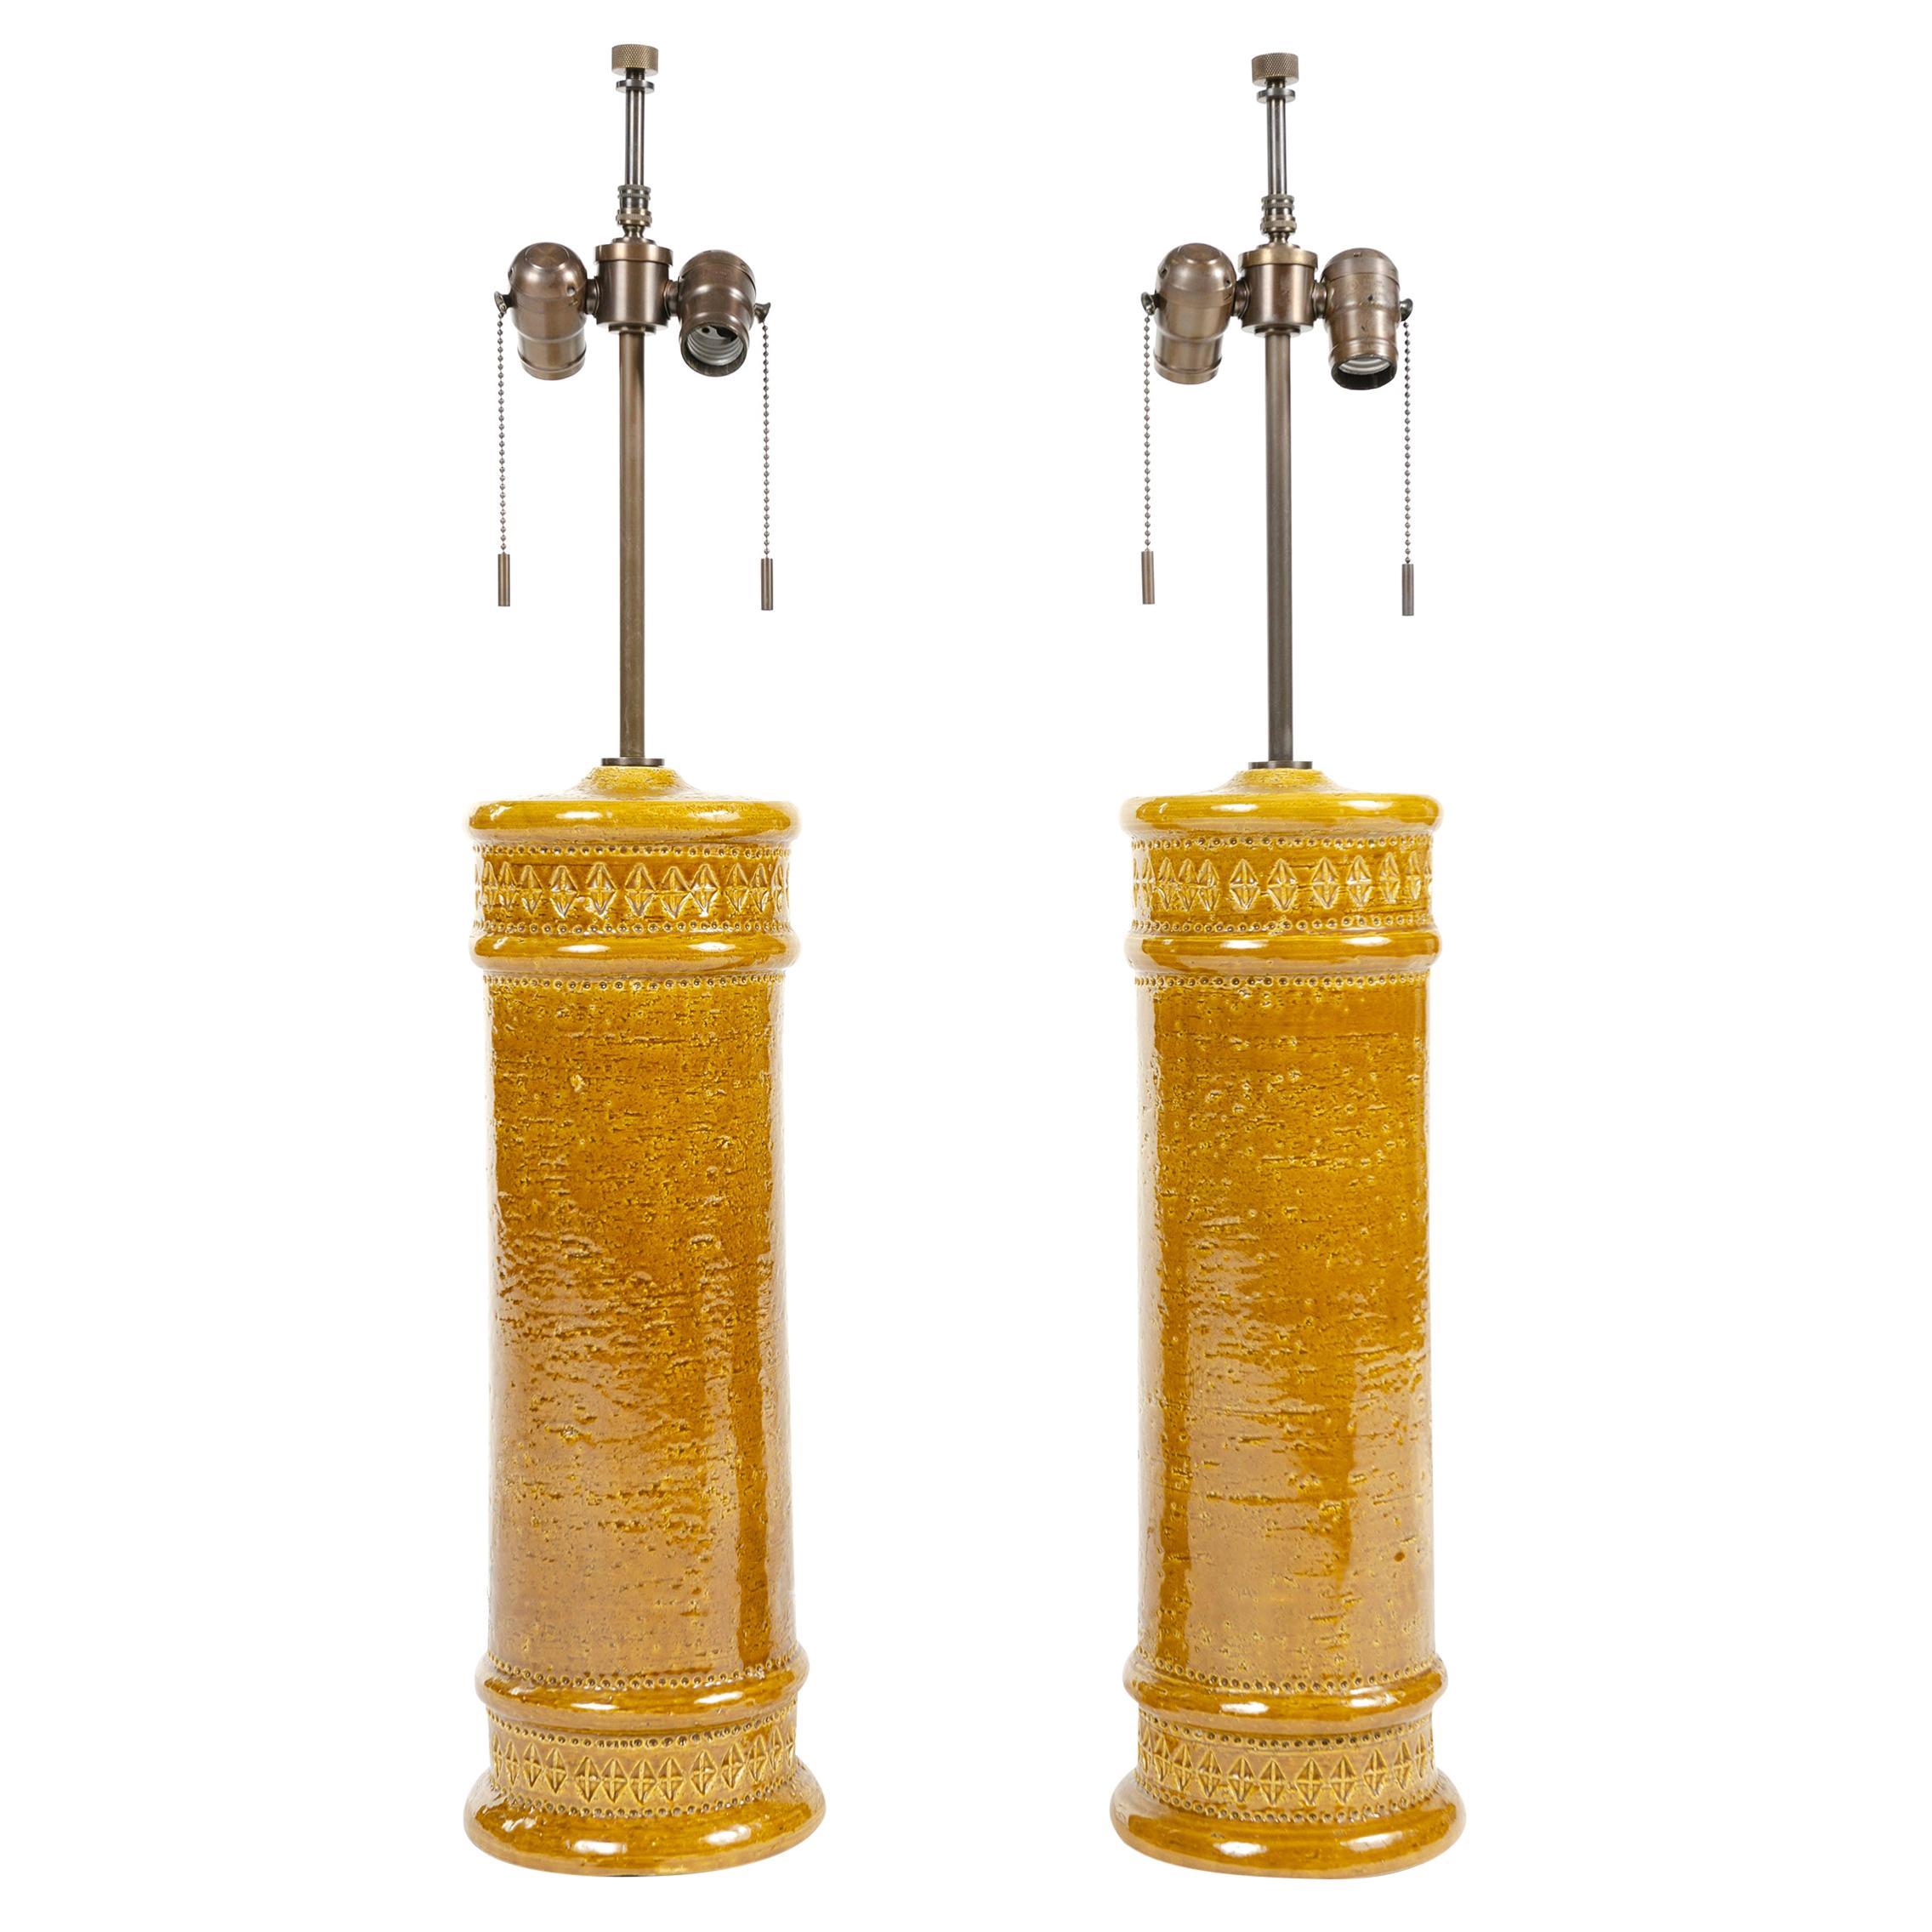 1960s Pair of Italian Ceramic Table Lamps